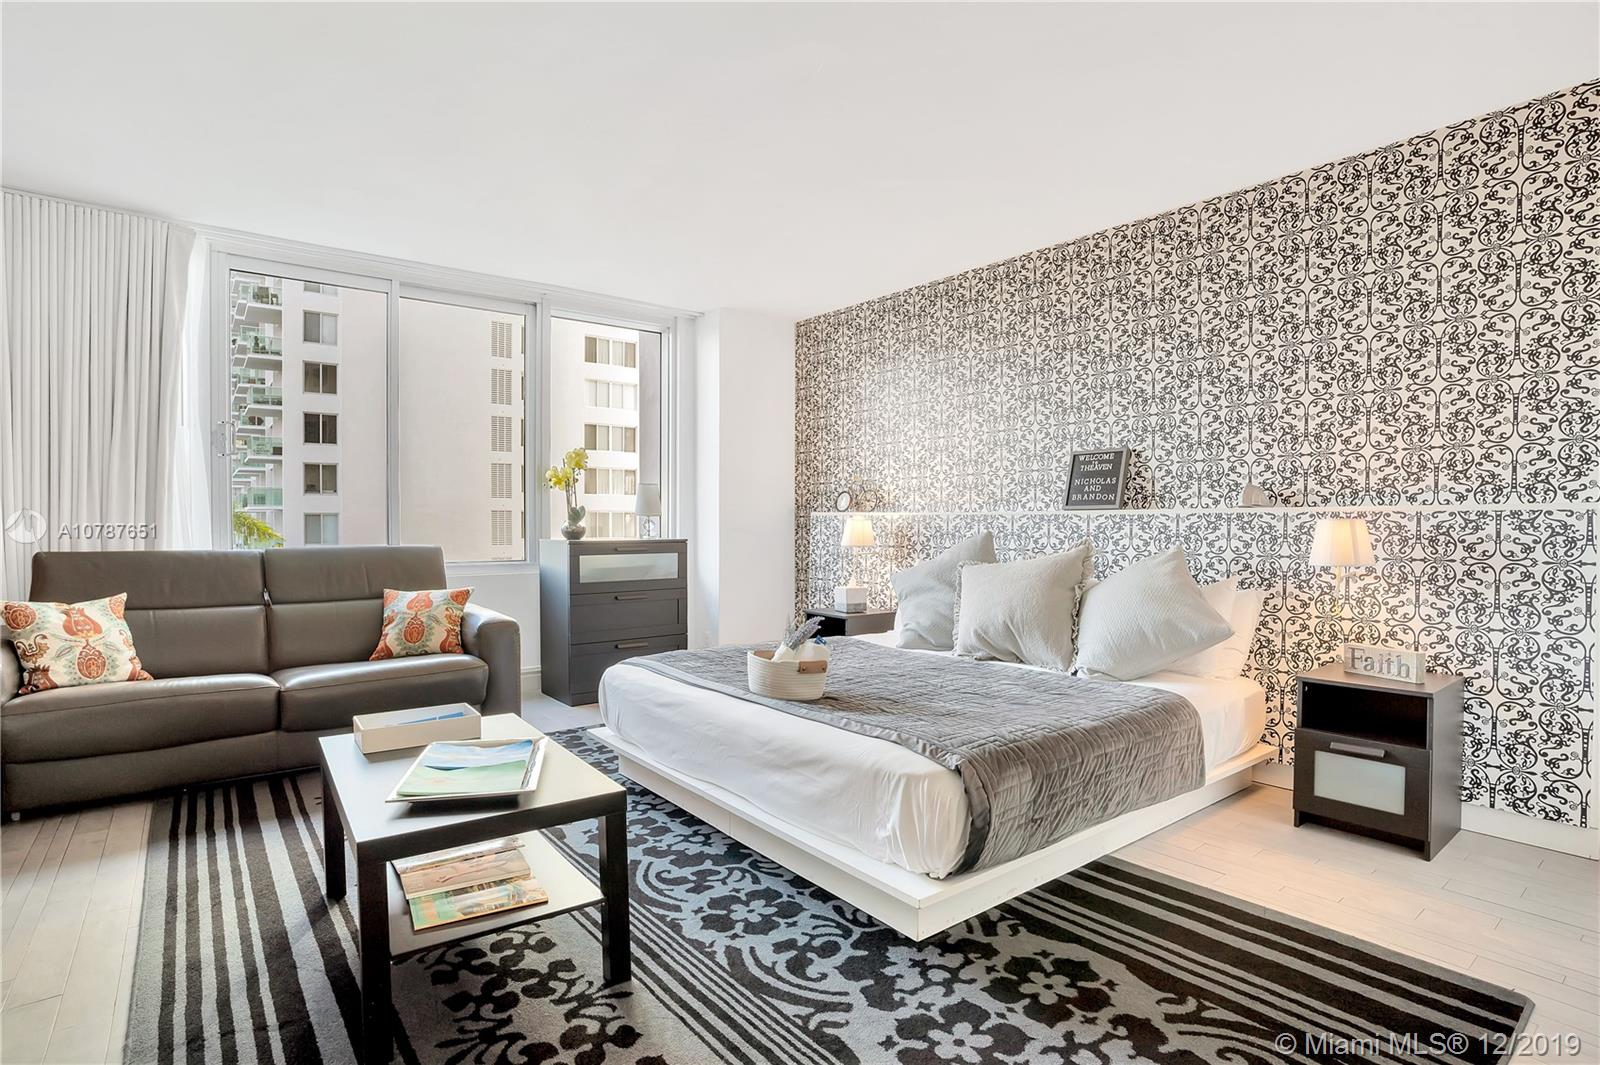 1100 West Ave #403, Miami Beach, FL 33139 - Miami Beach, FL real estate listing